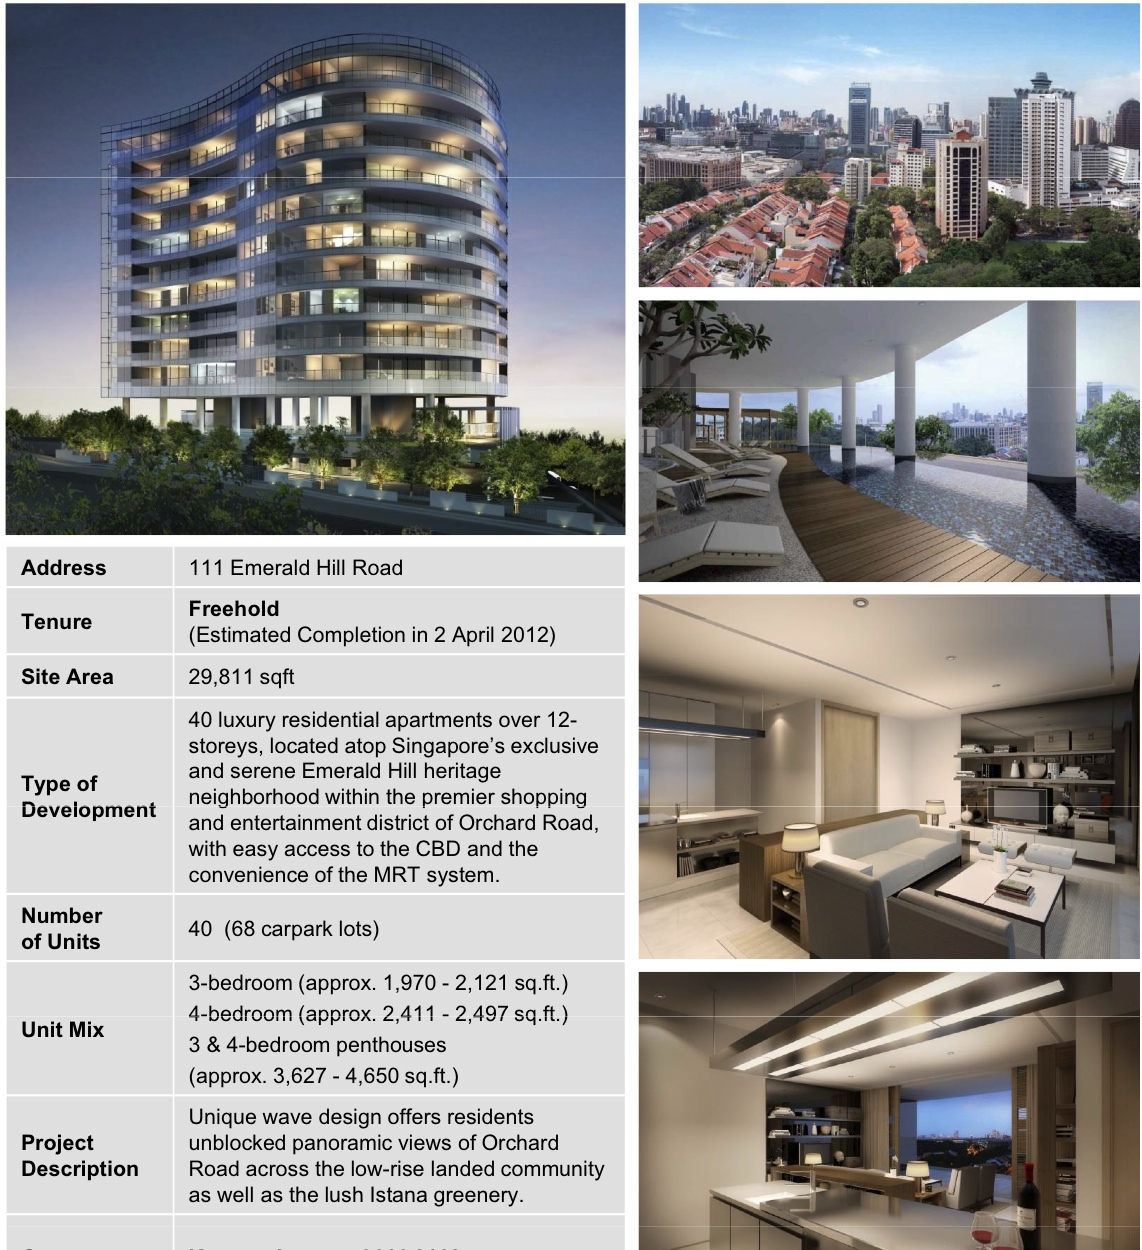 Emerald Hills Apartments: Singapore Property Online 新加坡网上房地产: 111 Emerald Hill. Pls